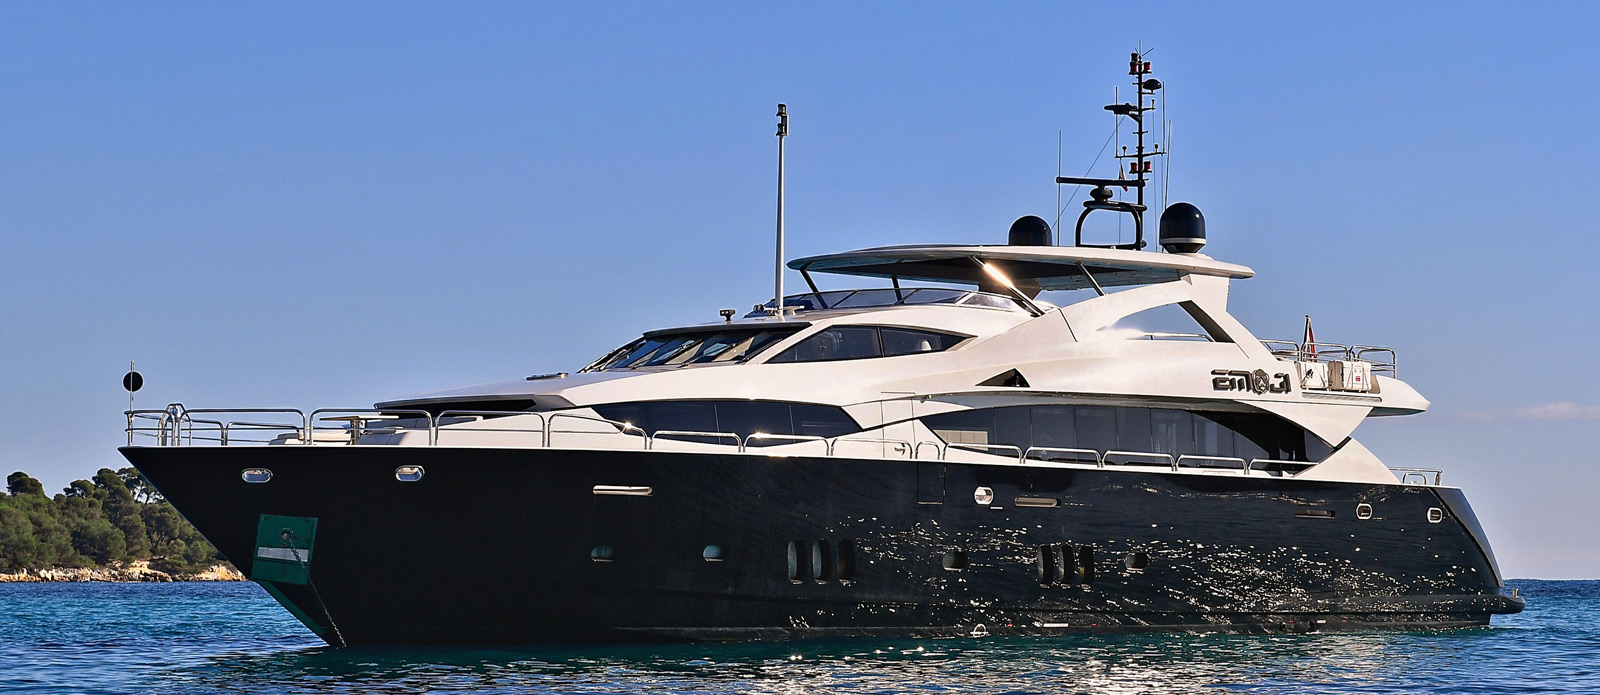 Sunseeker-34-Metre-Yacht---Emoji---Bow-View-2